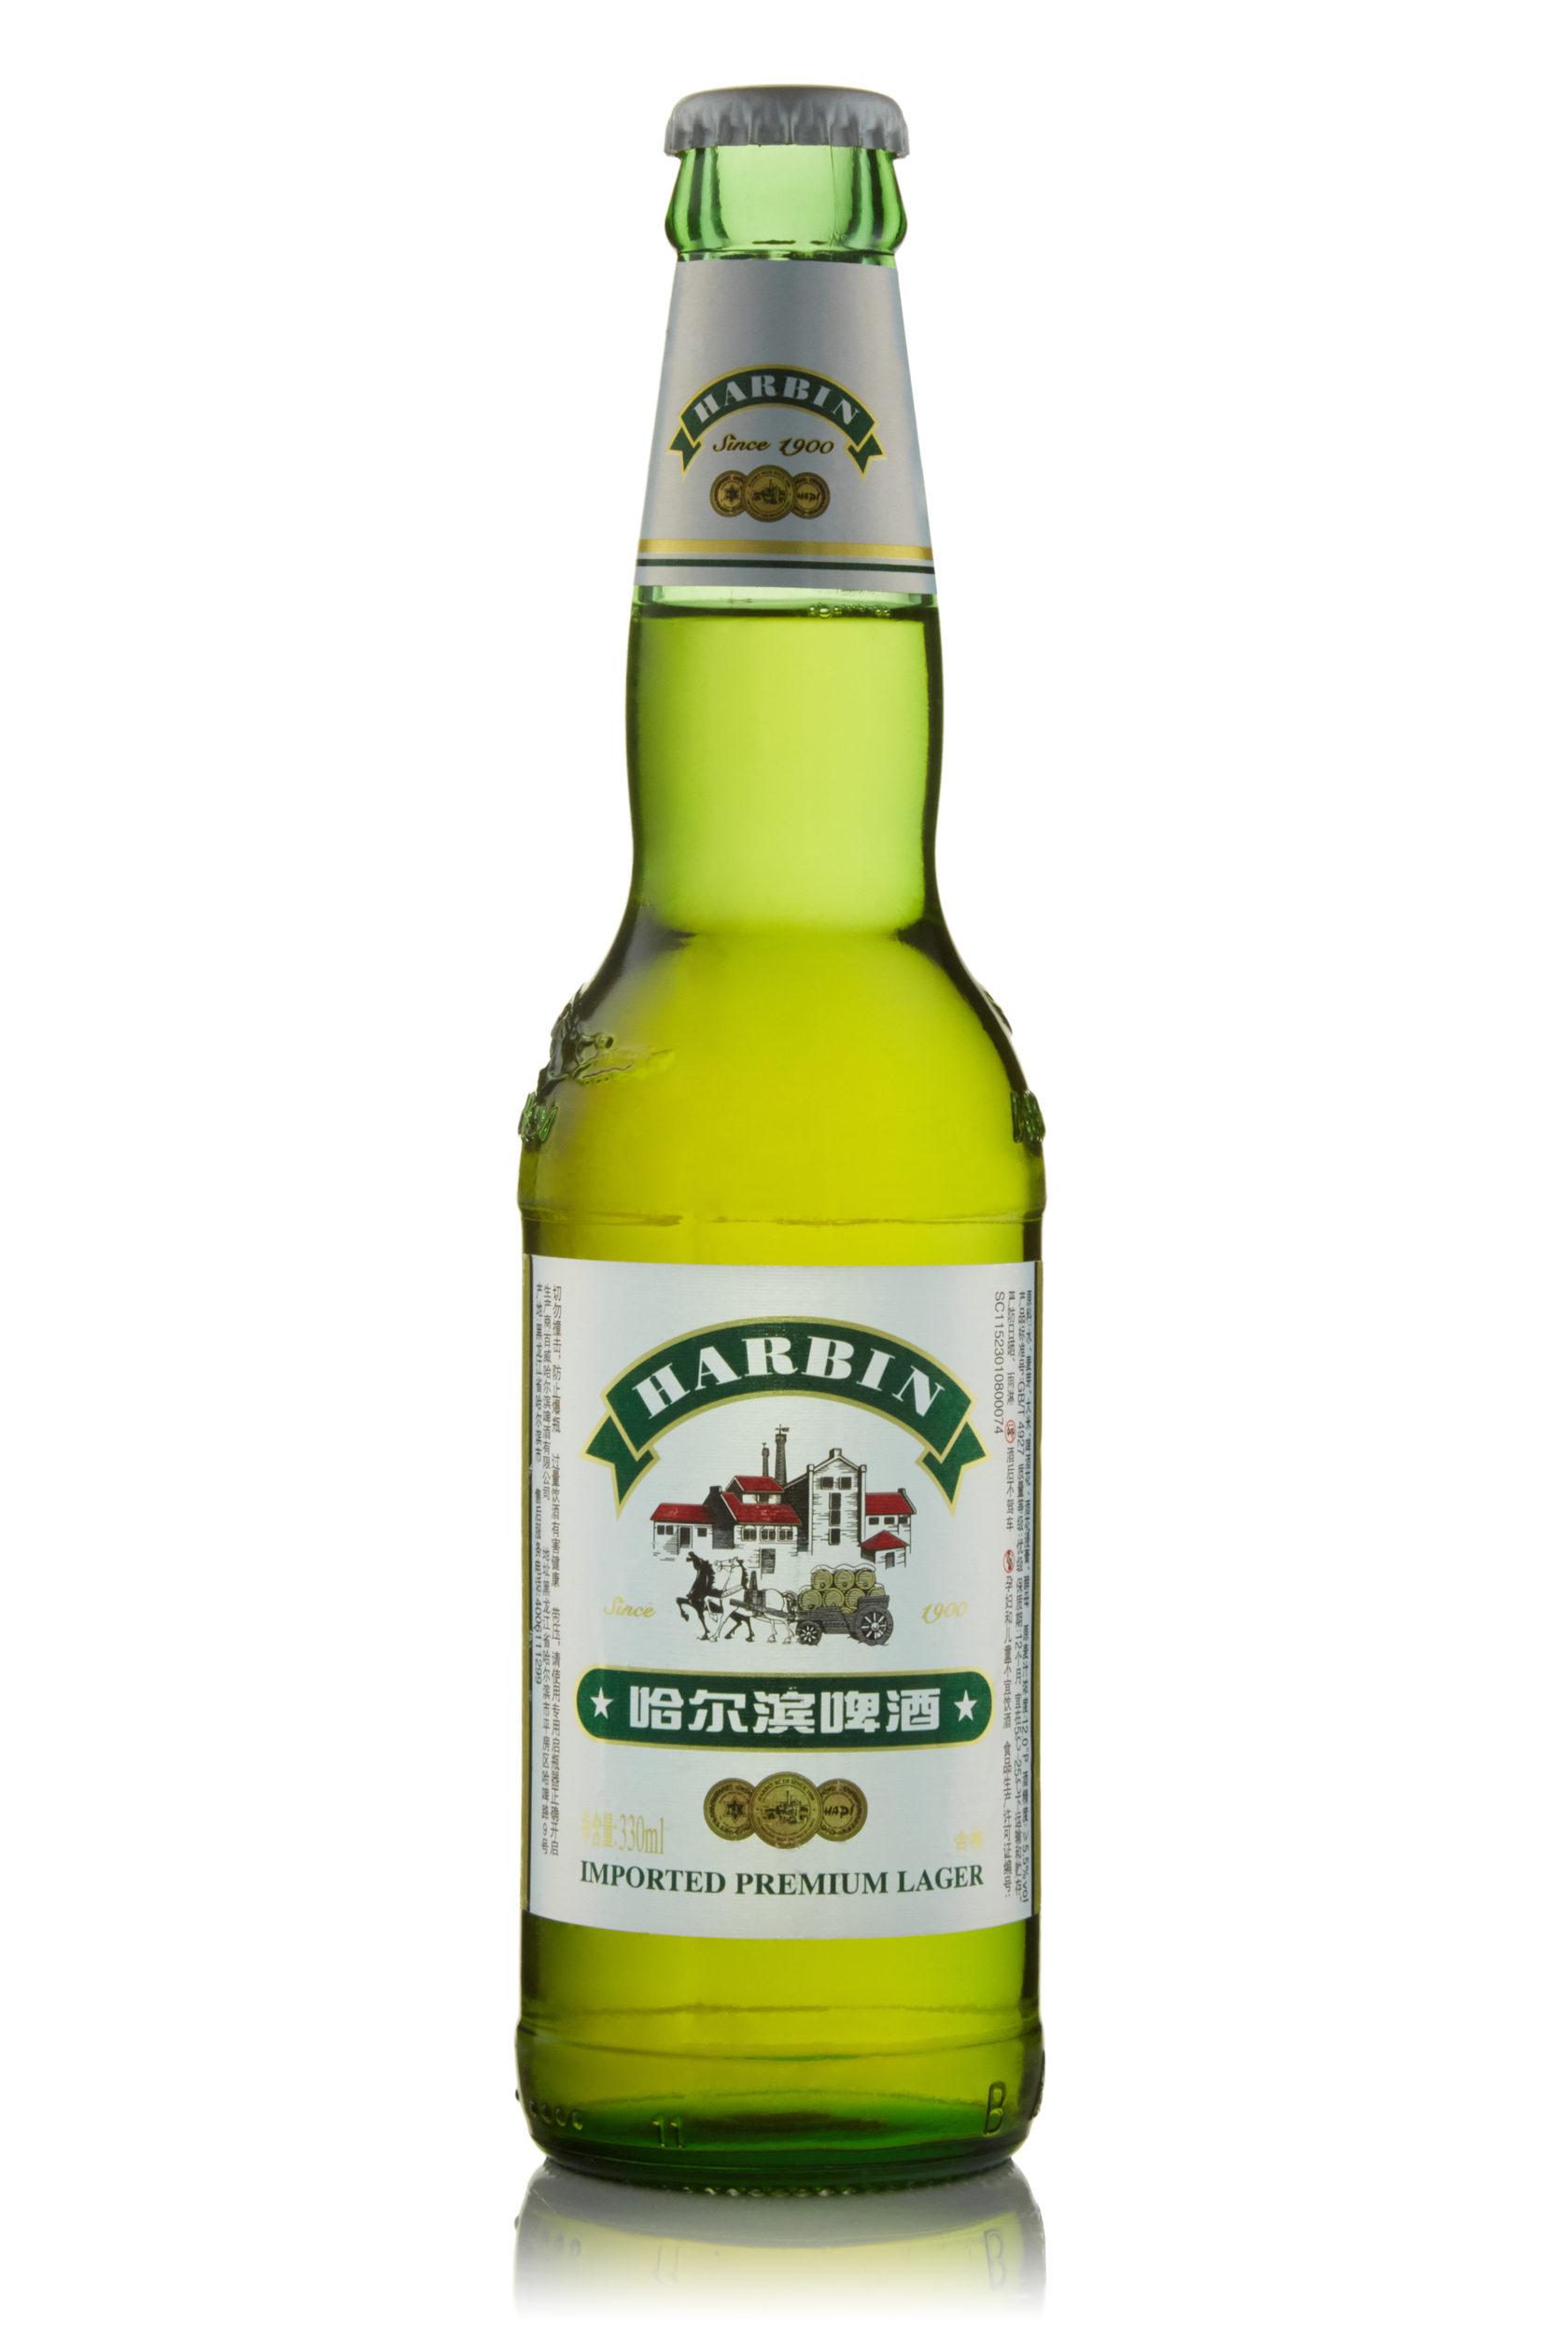 Купить пиво оптом Харбин Премиум 330 мл ст/б